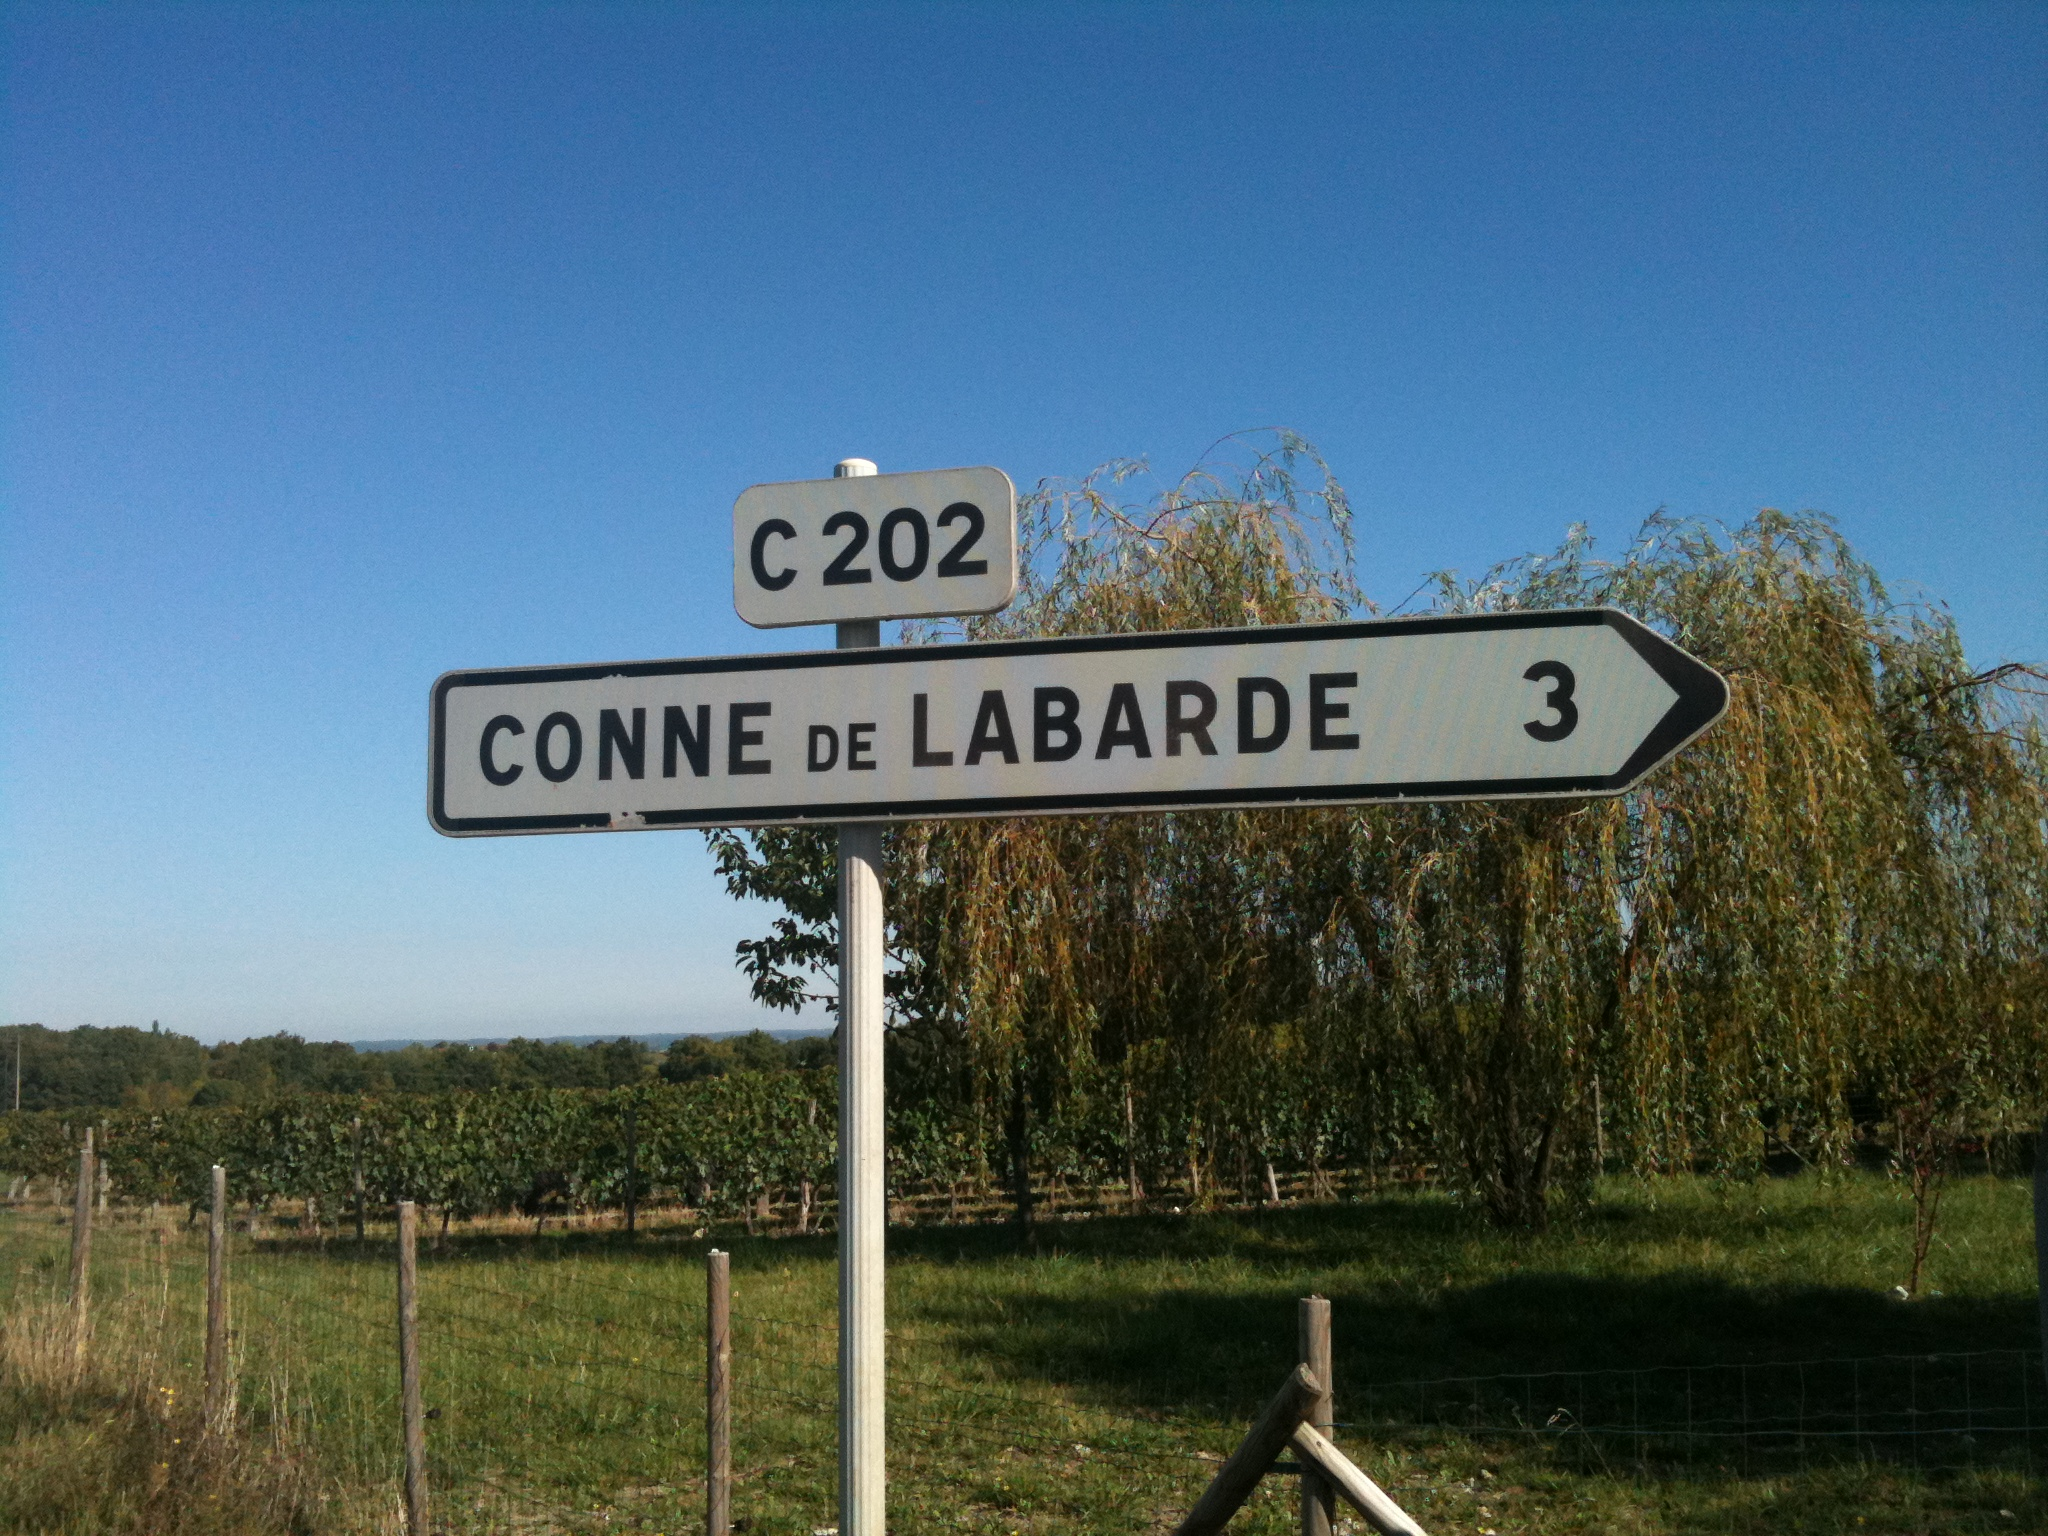 Conne de Labarde